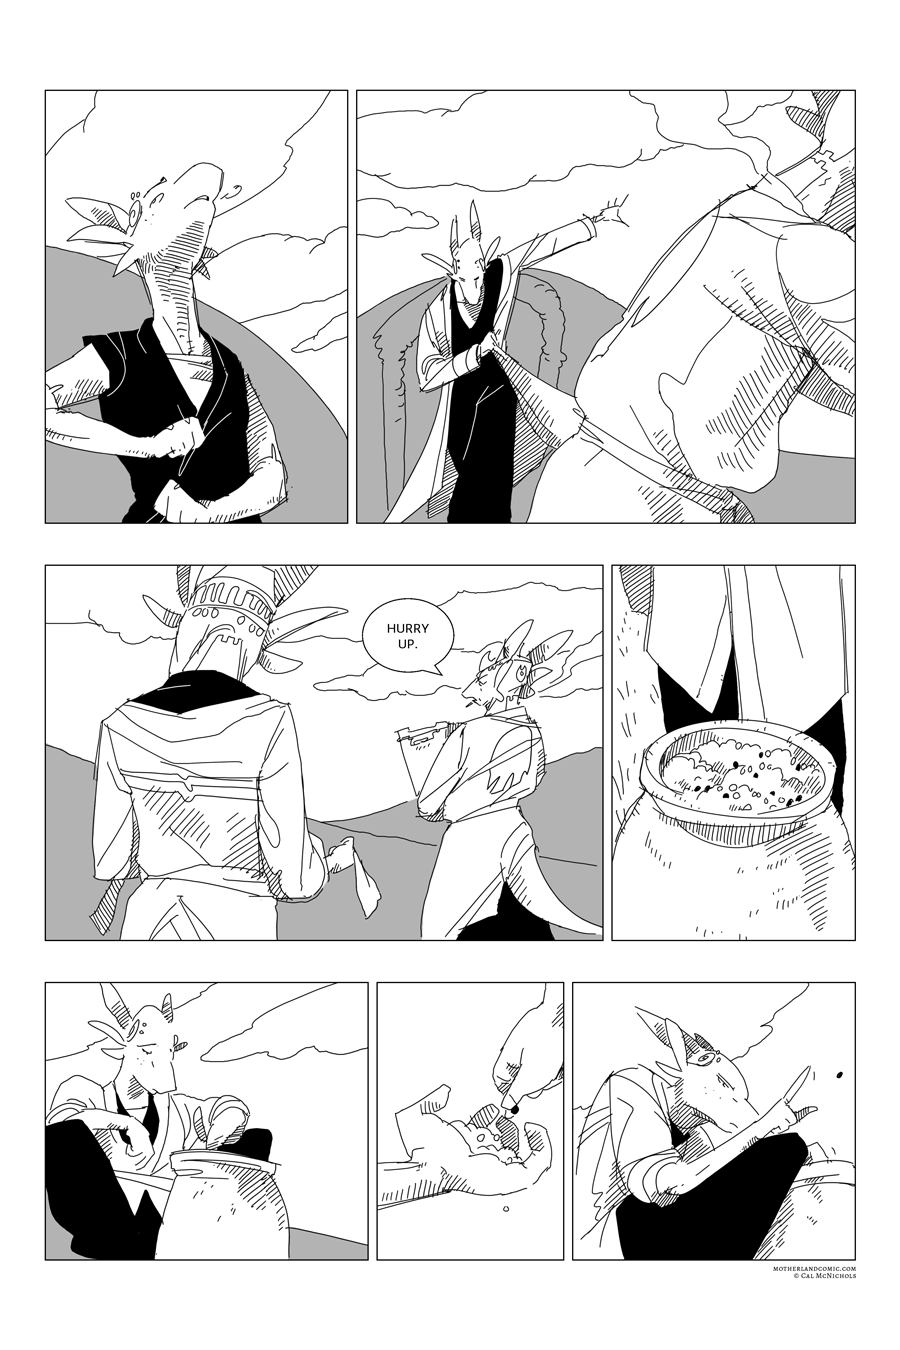 pg 58